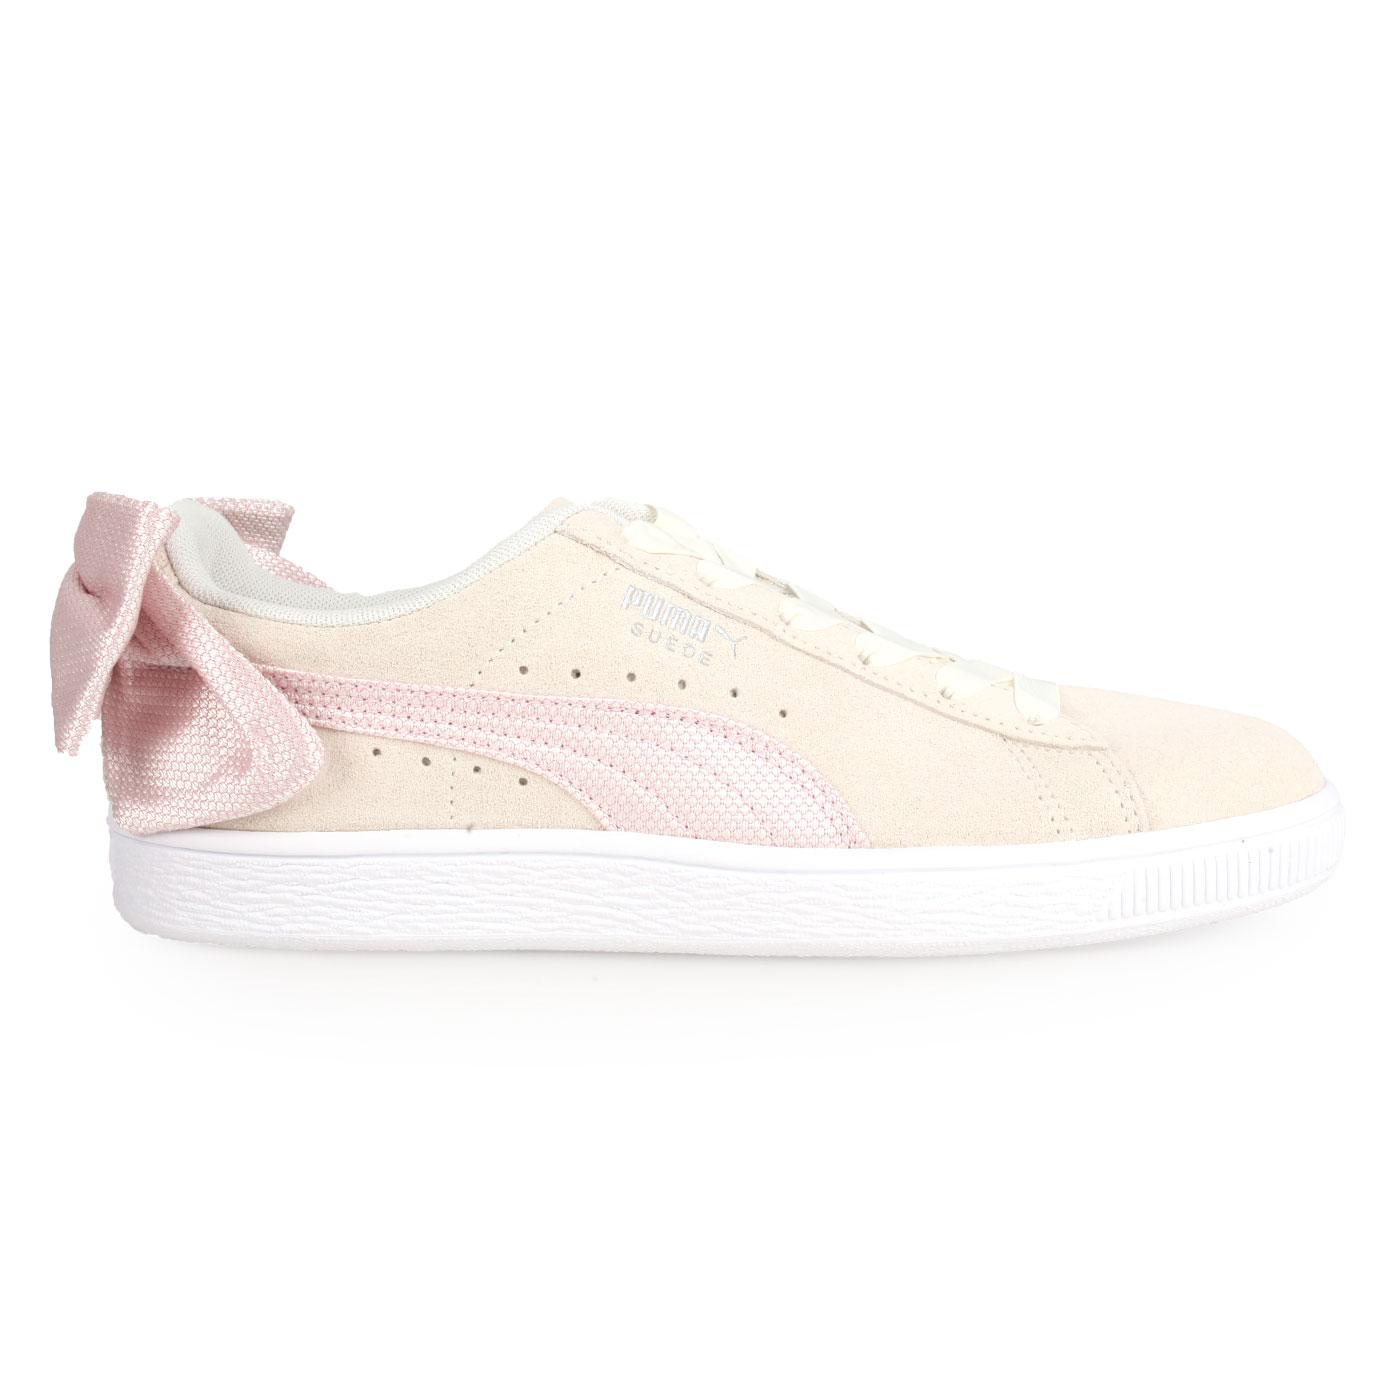 PUMA 女款休閒運動鞋(蝴蝶結款)  @Suede Bow Hexamesh Wn's@36915102 - 淺卡其粉